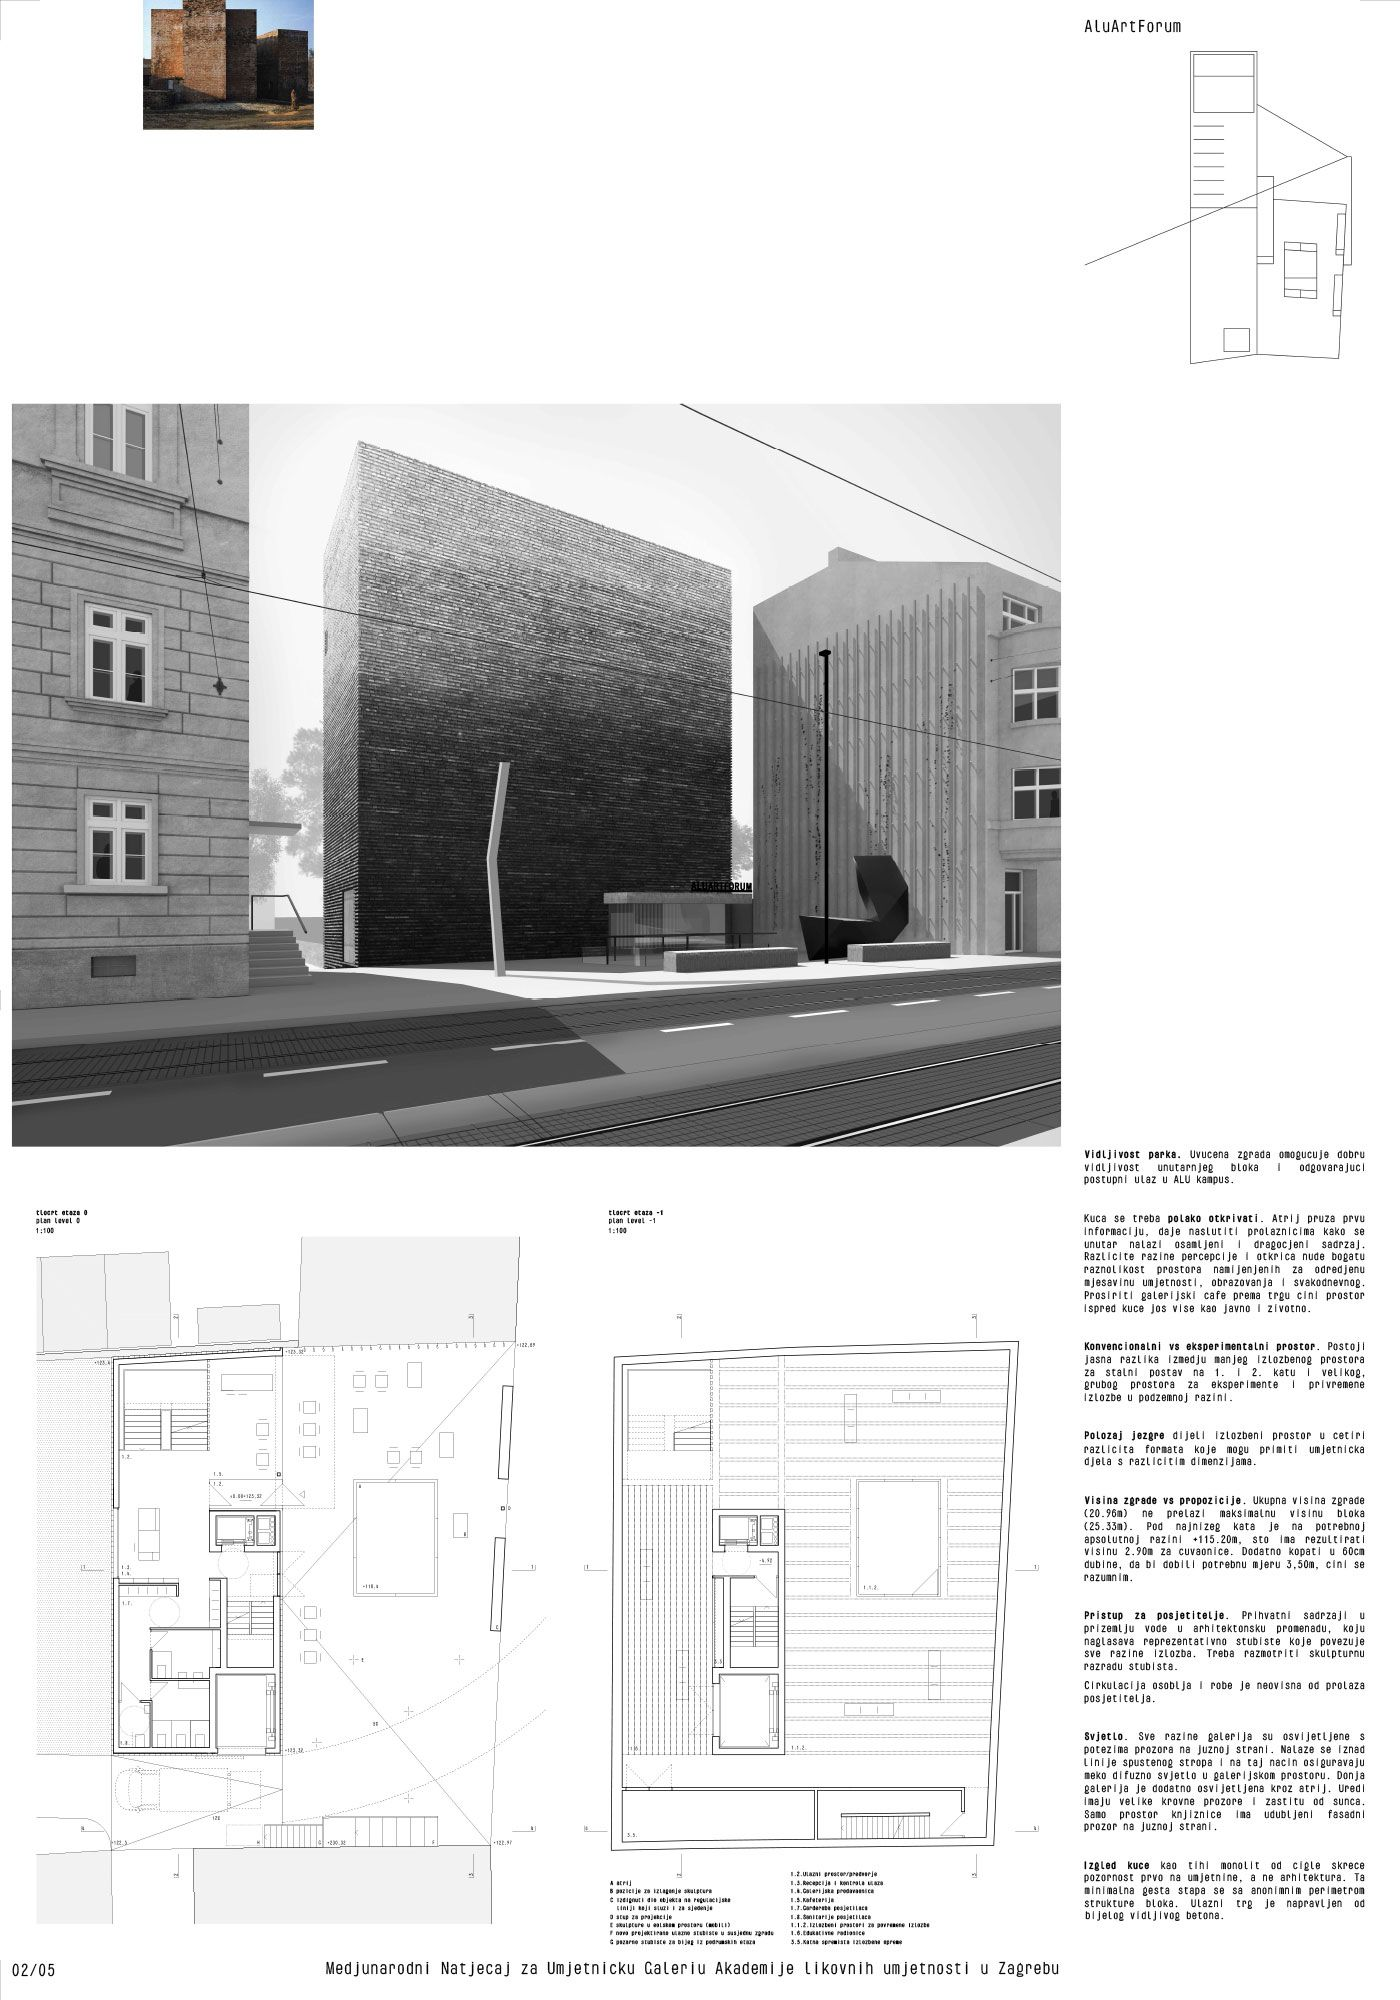 Njiric Arhitekti Aluartforum